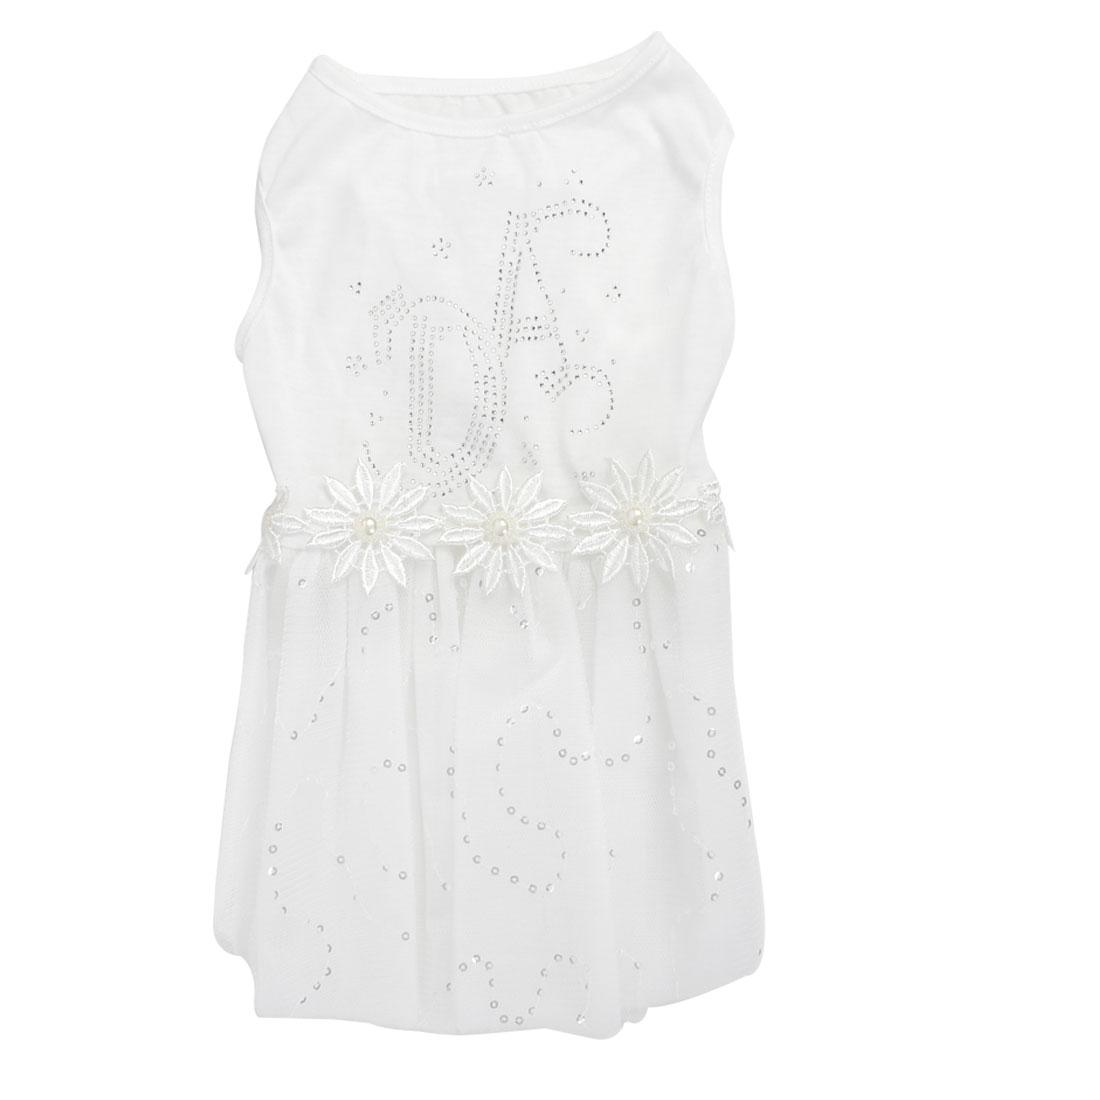 Pet Dog Doggie Flowers Decor Sleeveless Wedding Dress Skirt White Size L